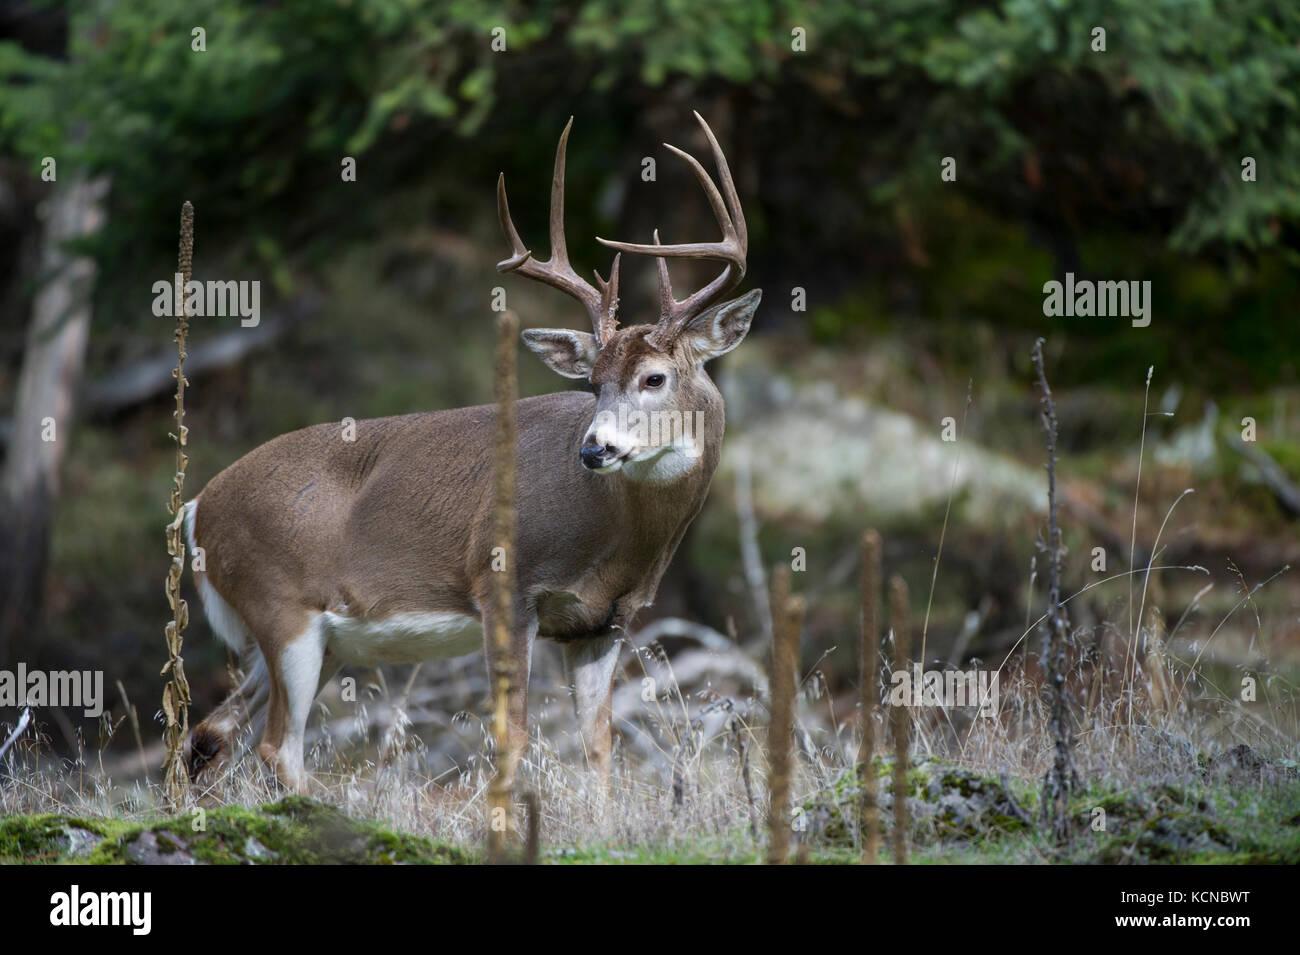 Male Whitetail Deer, Odocoileus virginianus, Central Idaho, USA Stock Photo